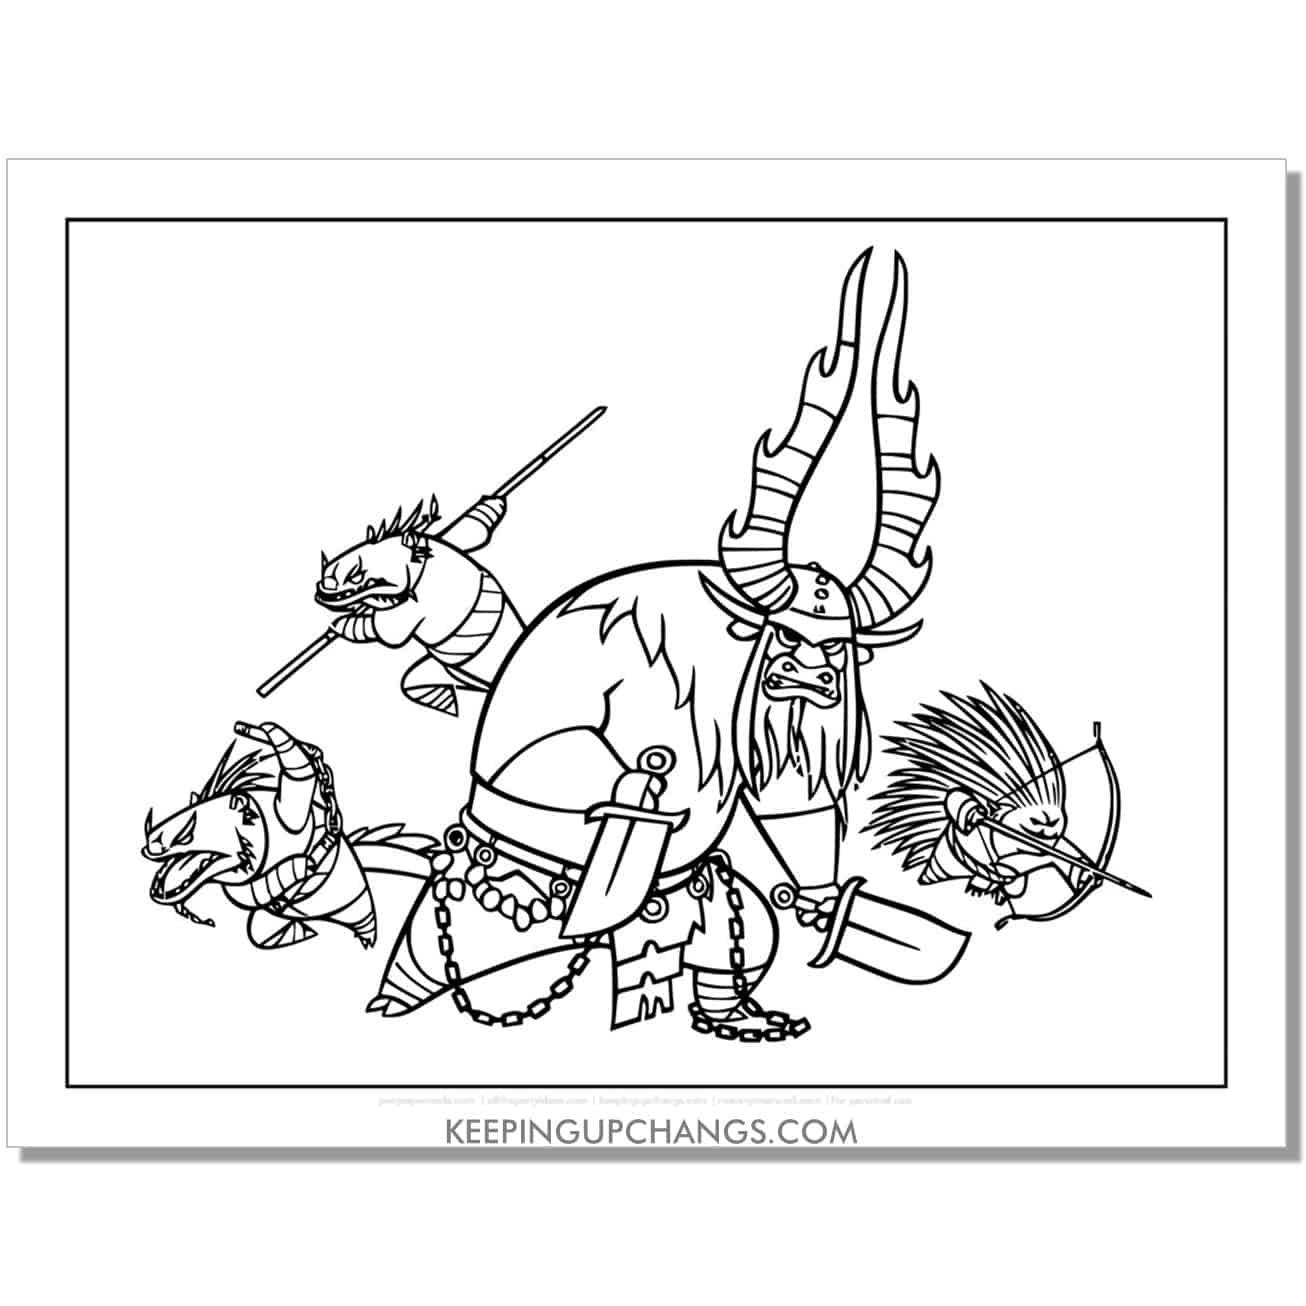 free kai the villian coloring page.